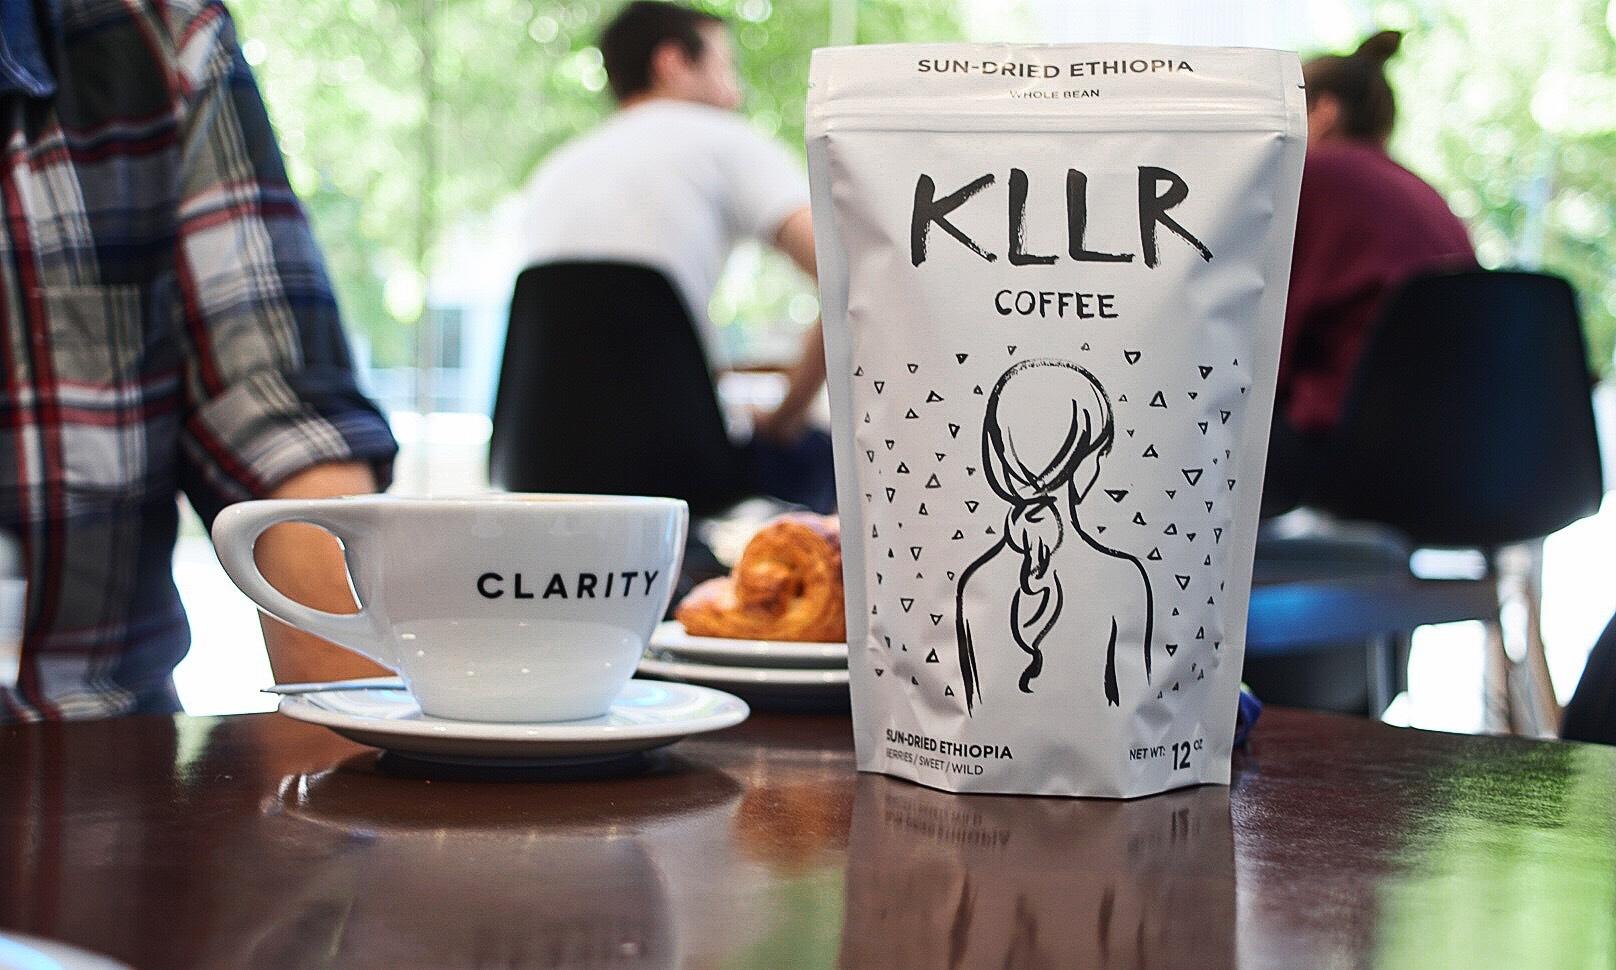 KLLR Coffee Ethiopia.jpg